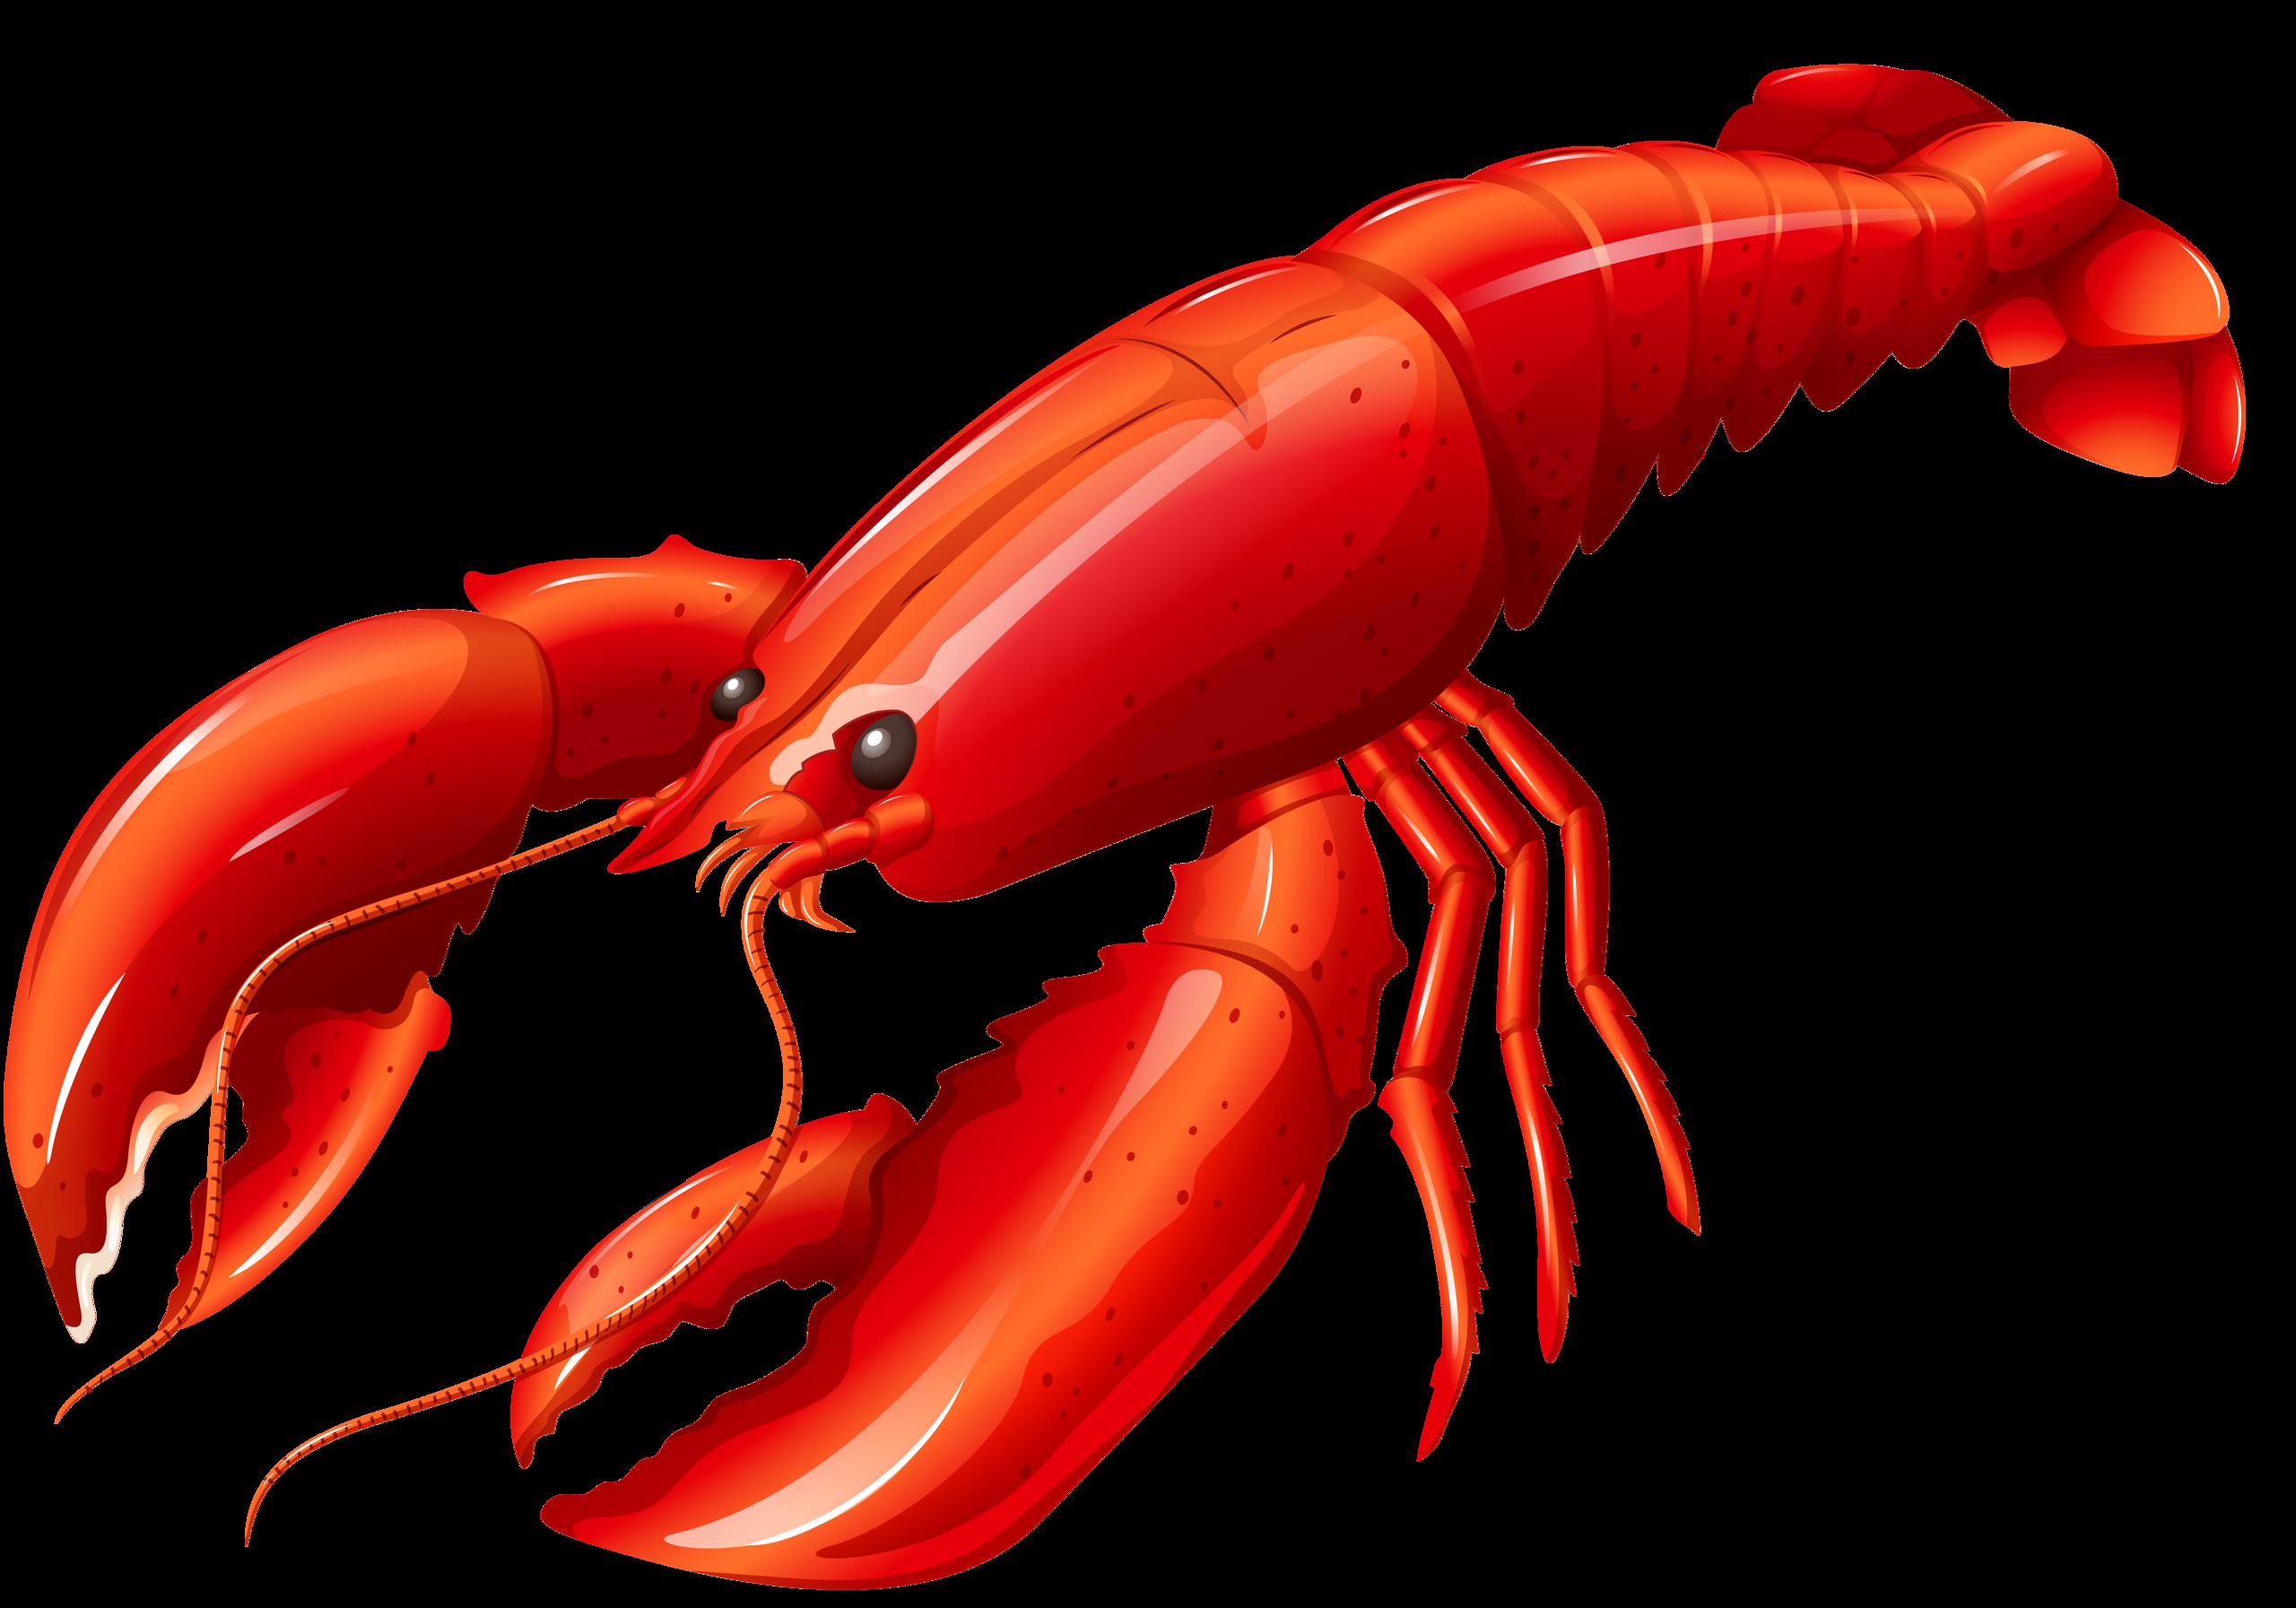 png pinterest clip. Crabs clipart crab boil